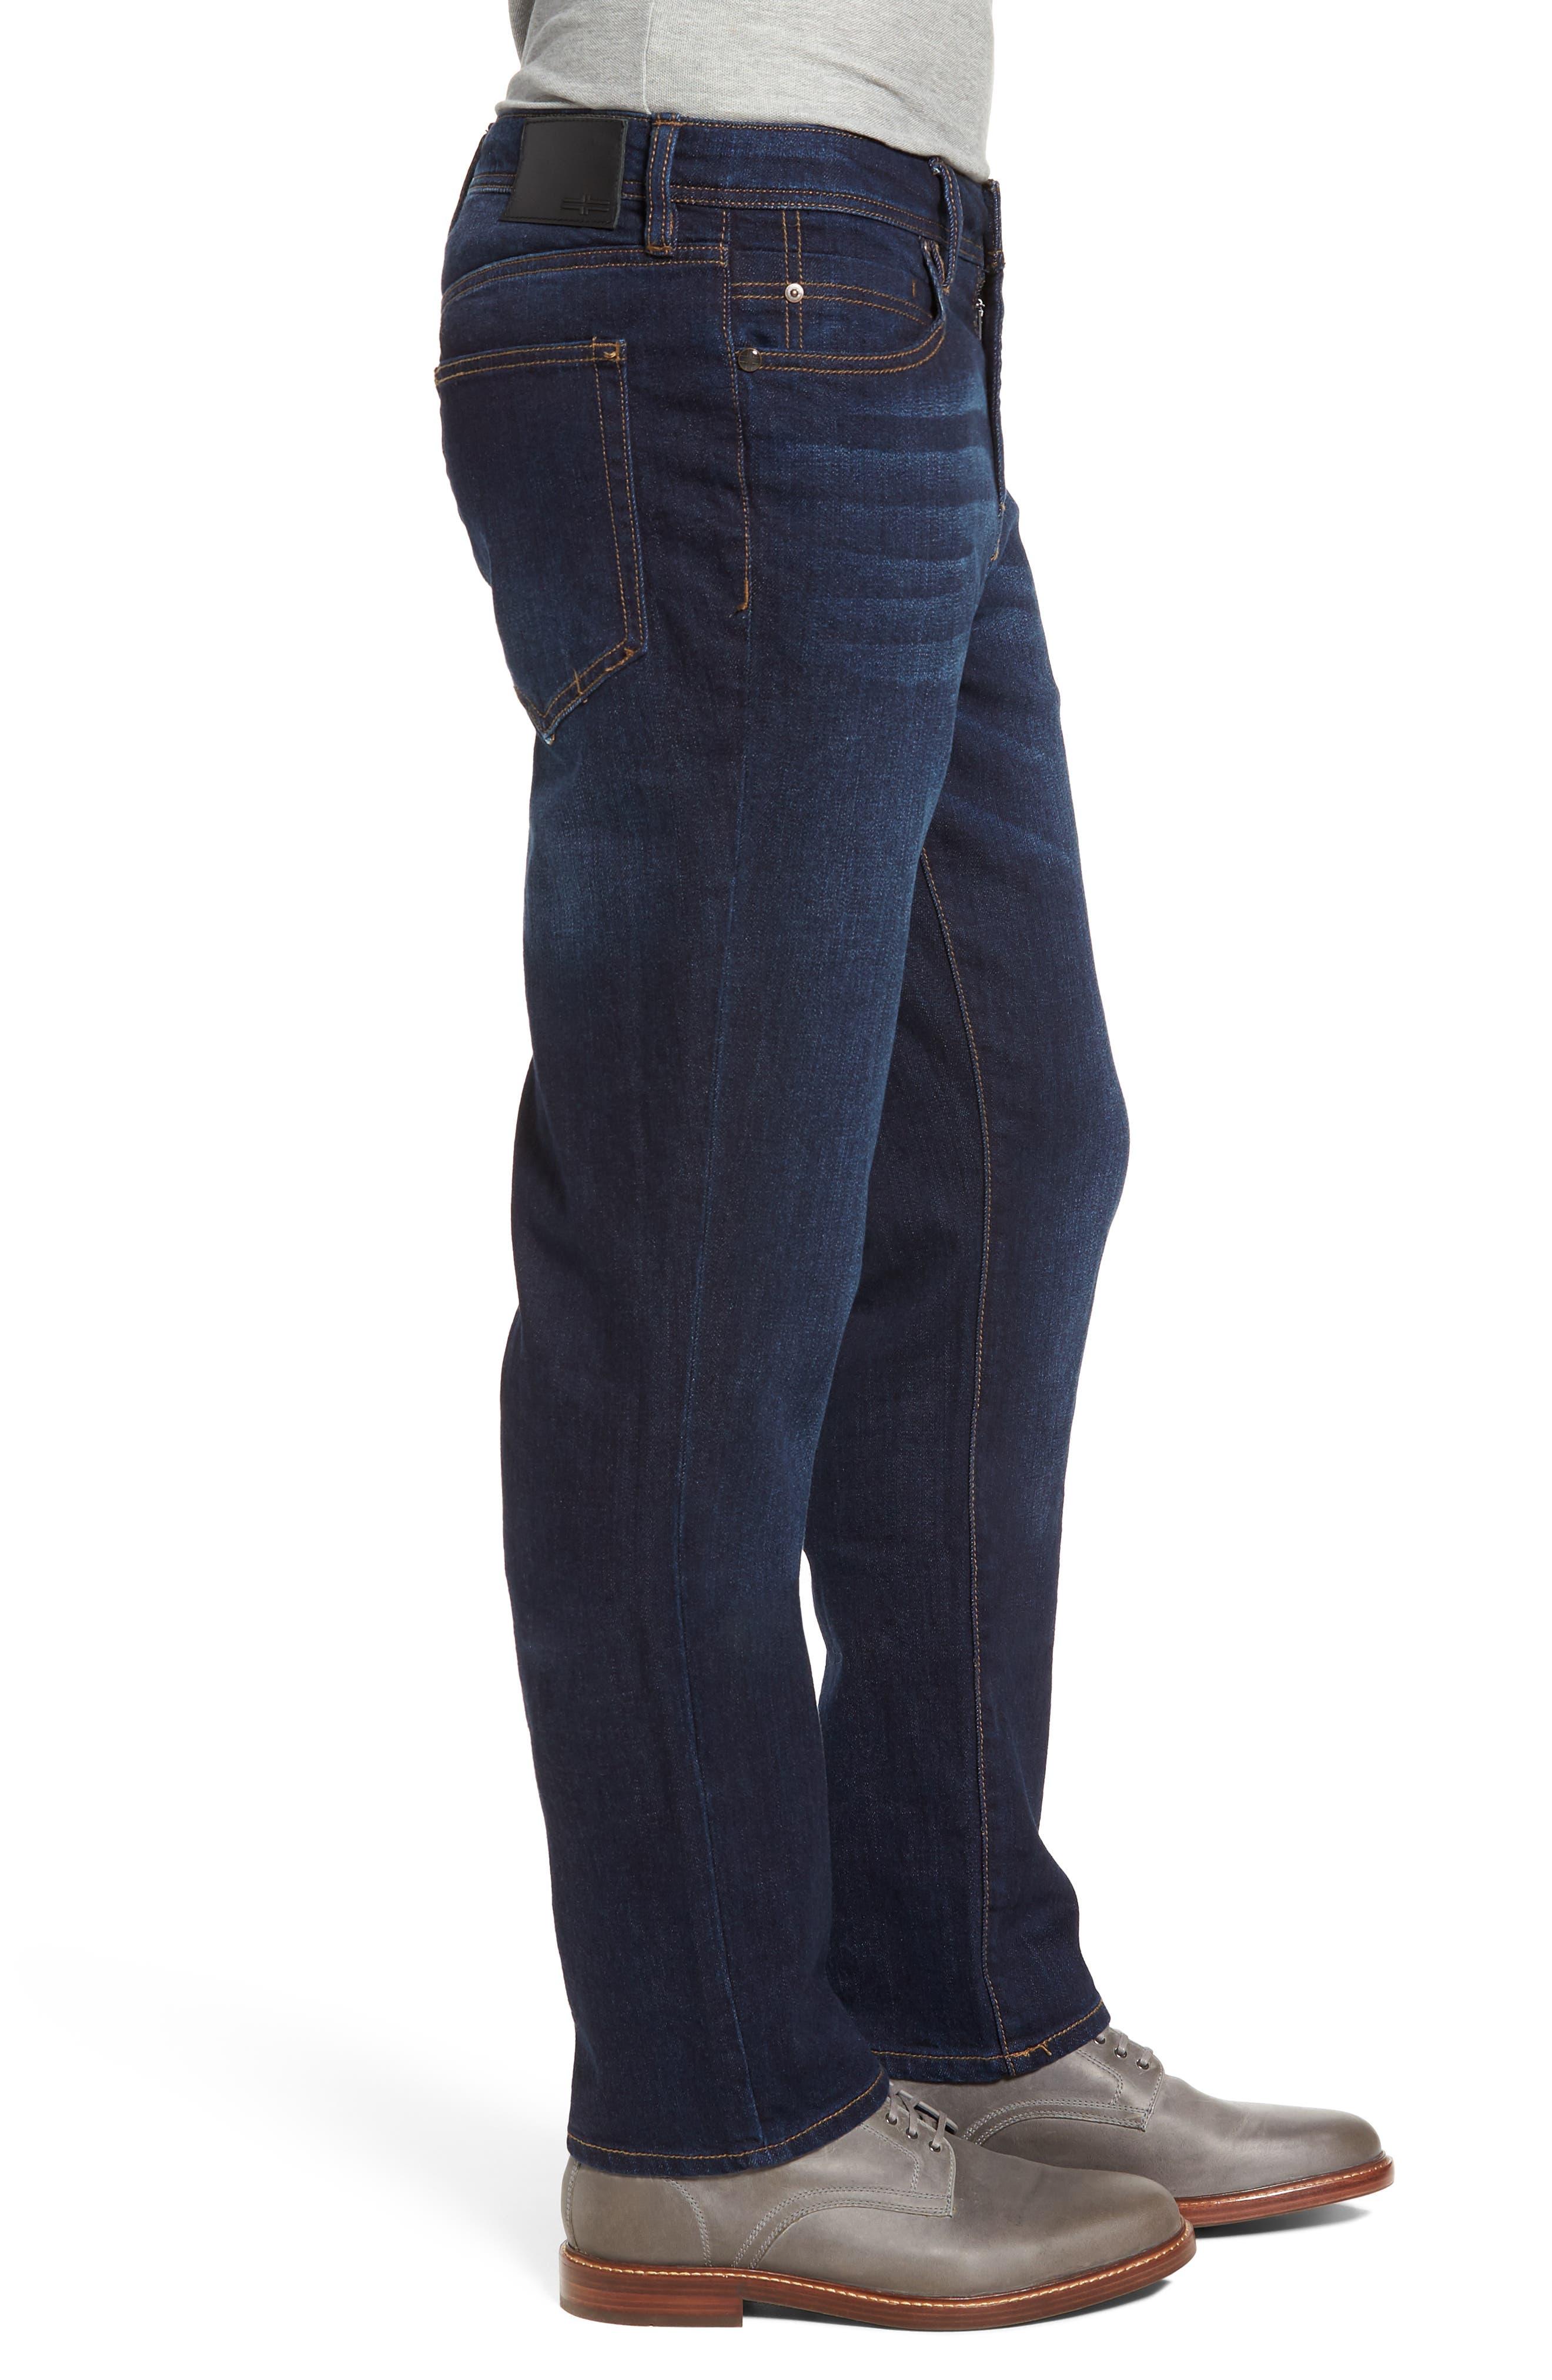 Jeans Co. Regent Relaxed Fit Jeans,                             Alternate thumbnail 3, color,                             SAN ARDO VINTAGE DARK